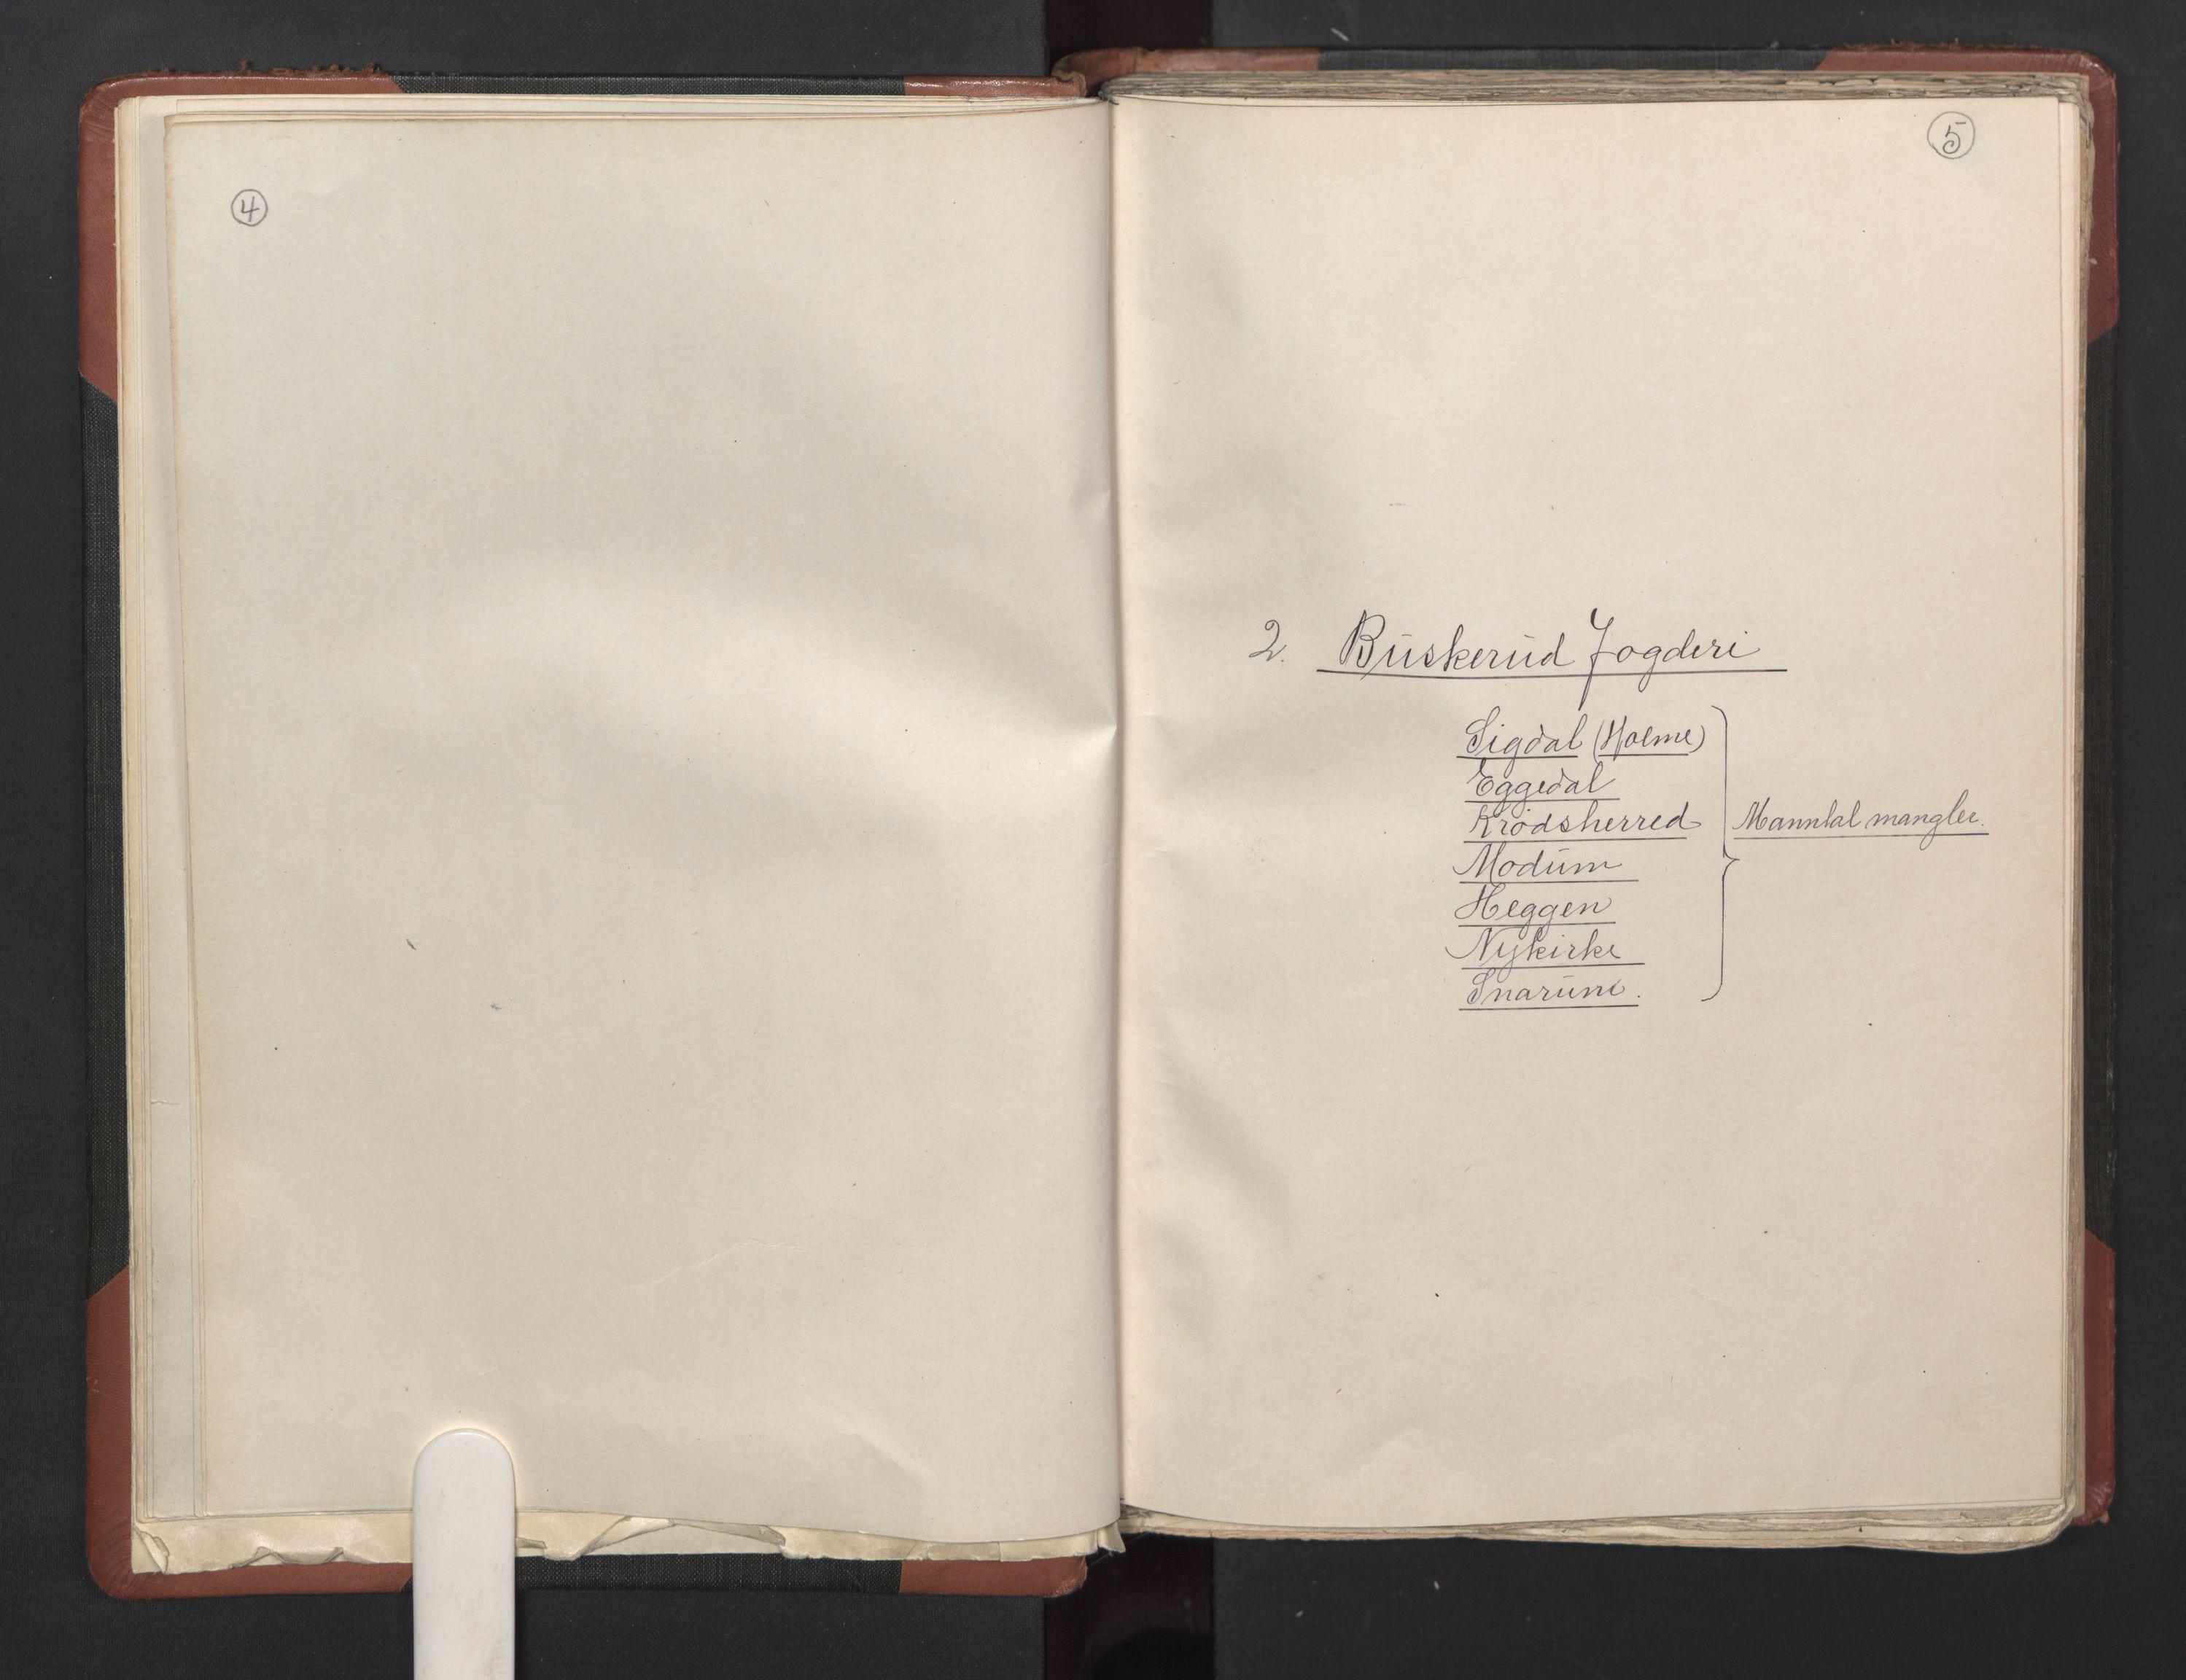 RA, Fogdenes og sorenskrivernes manntall 1664-1666, nr. 5: Fogderier (len og skipreider) i nåværende Buskerud fylke og Vestfold fylke, 1664, s. 4-5